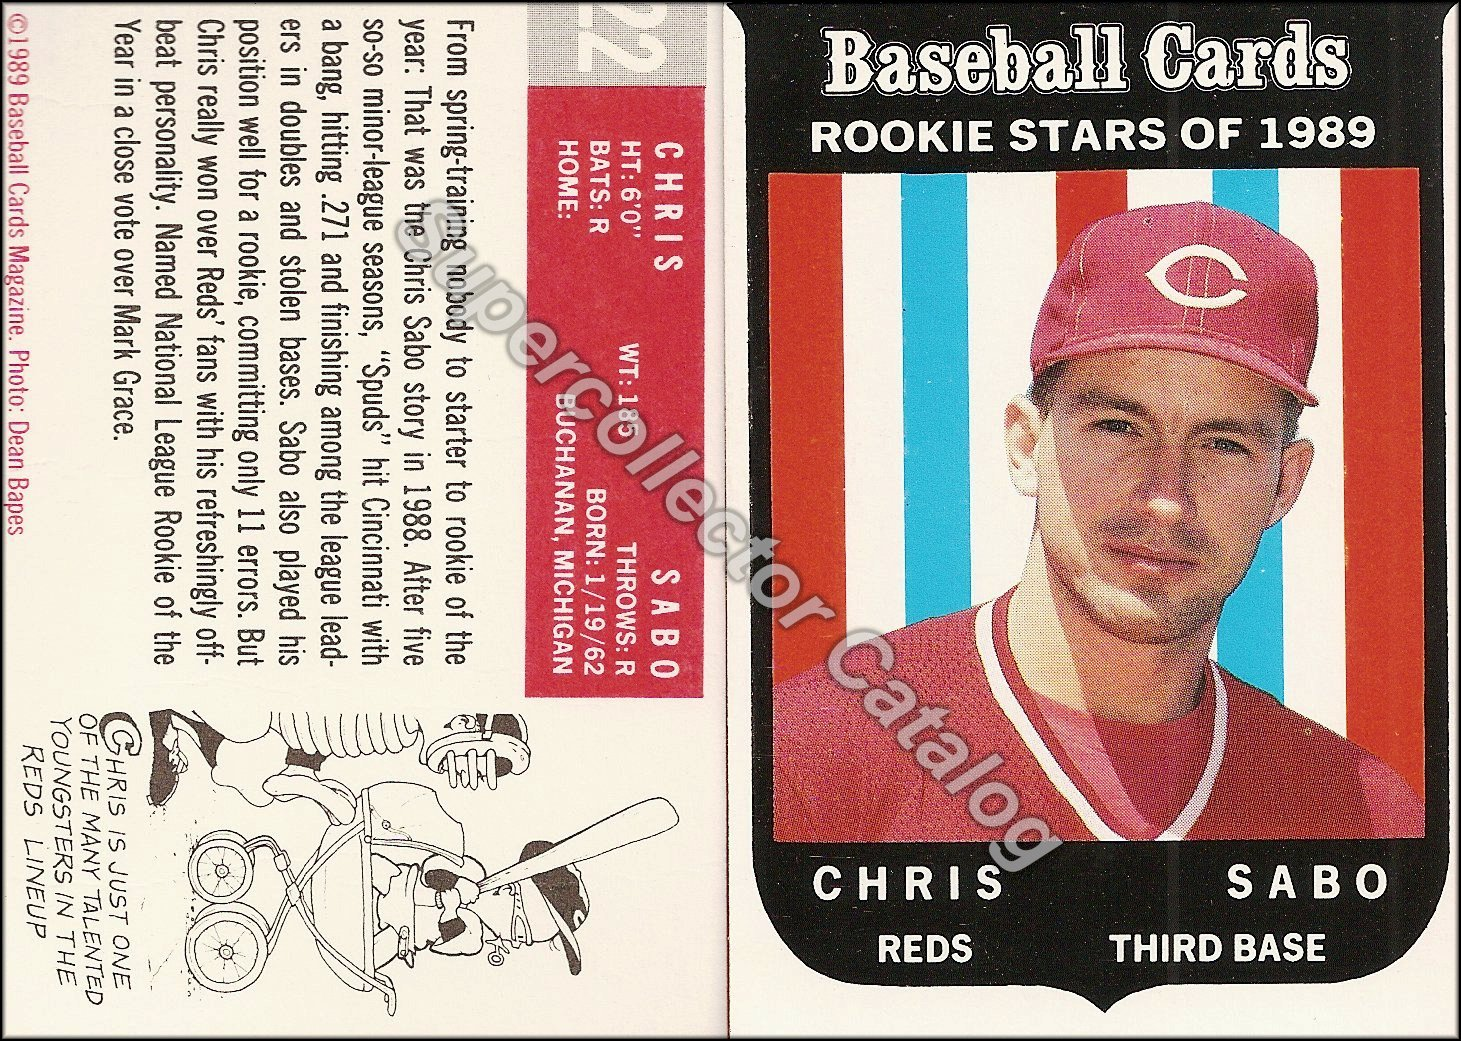 1989 Baseball Card Magazine Insert ('59 Topps - Rookie)